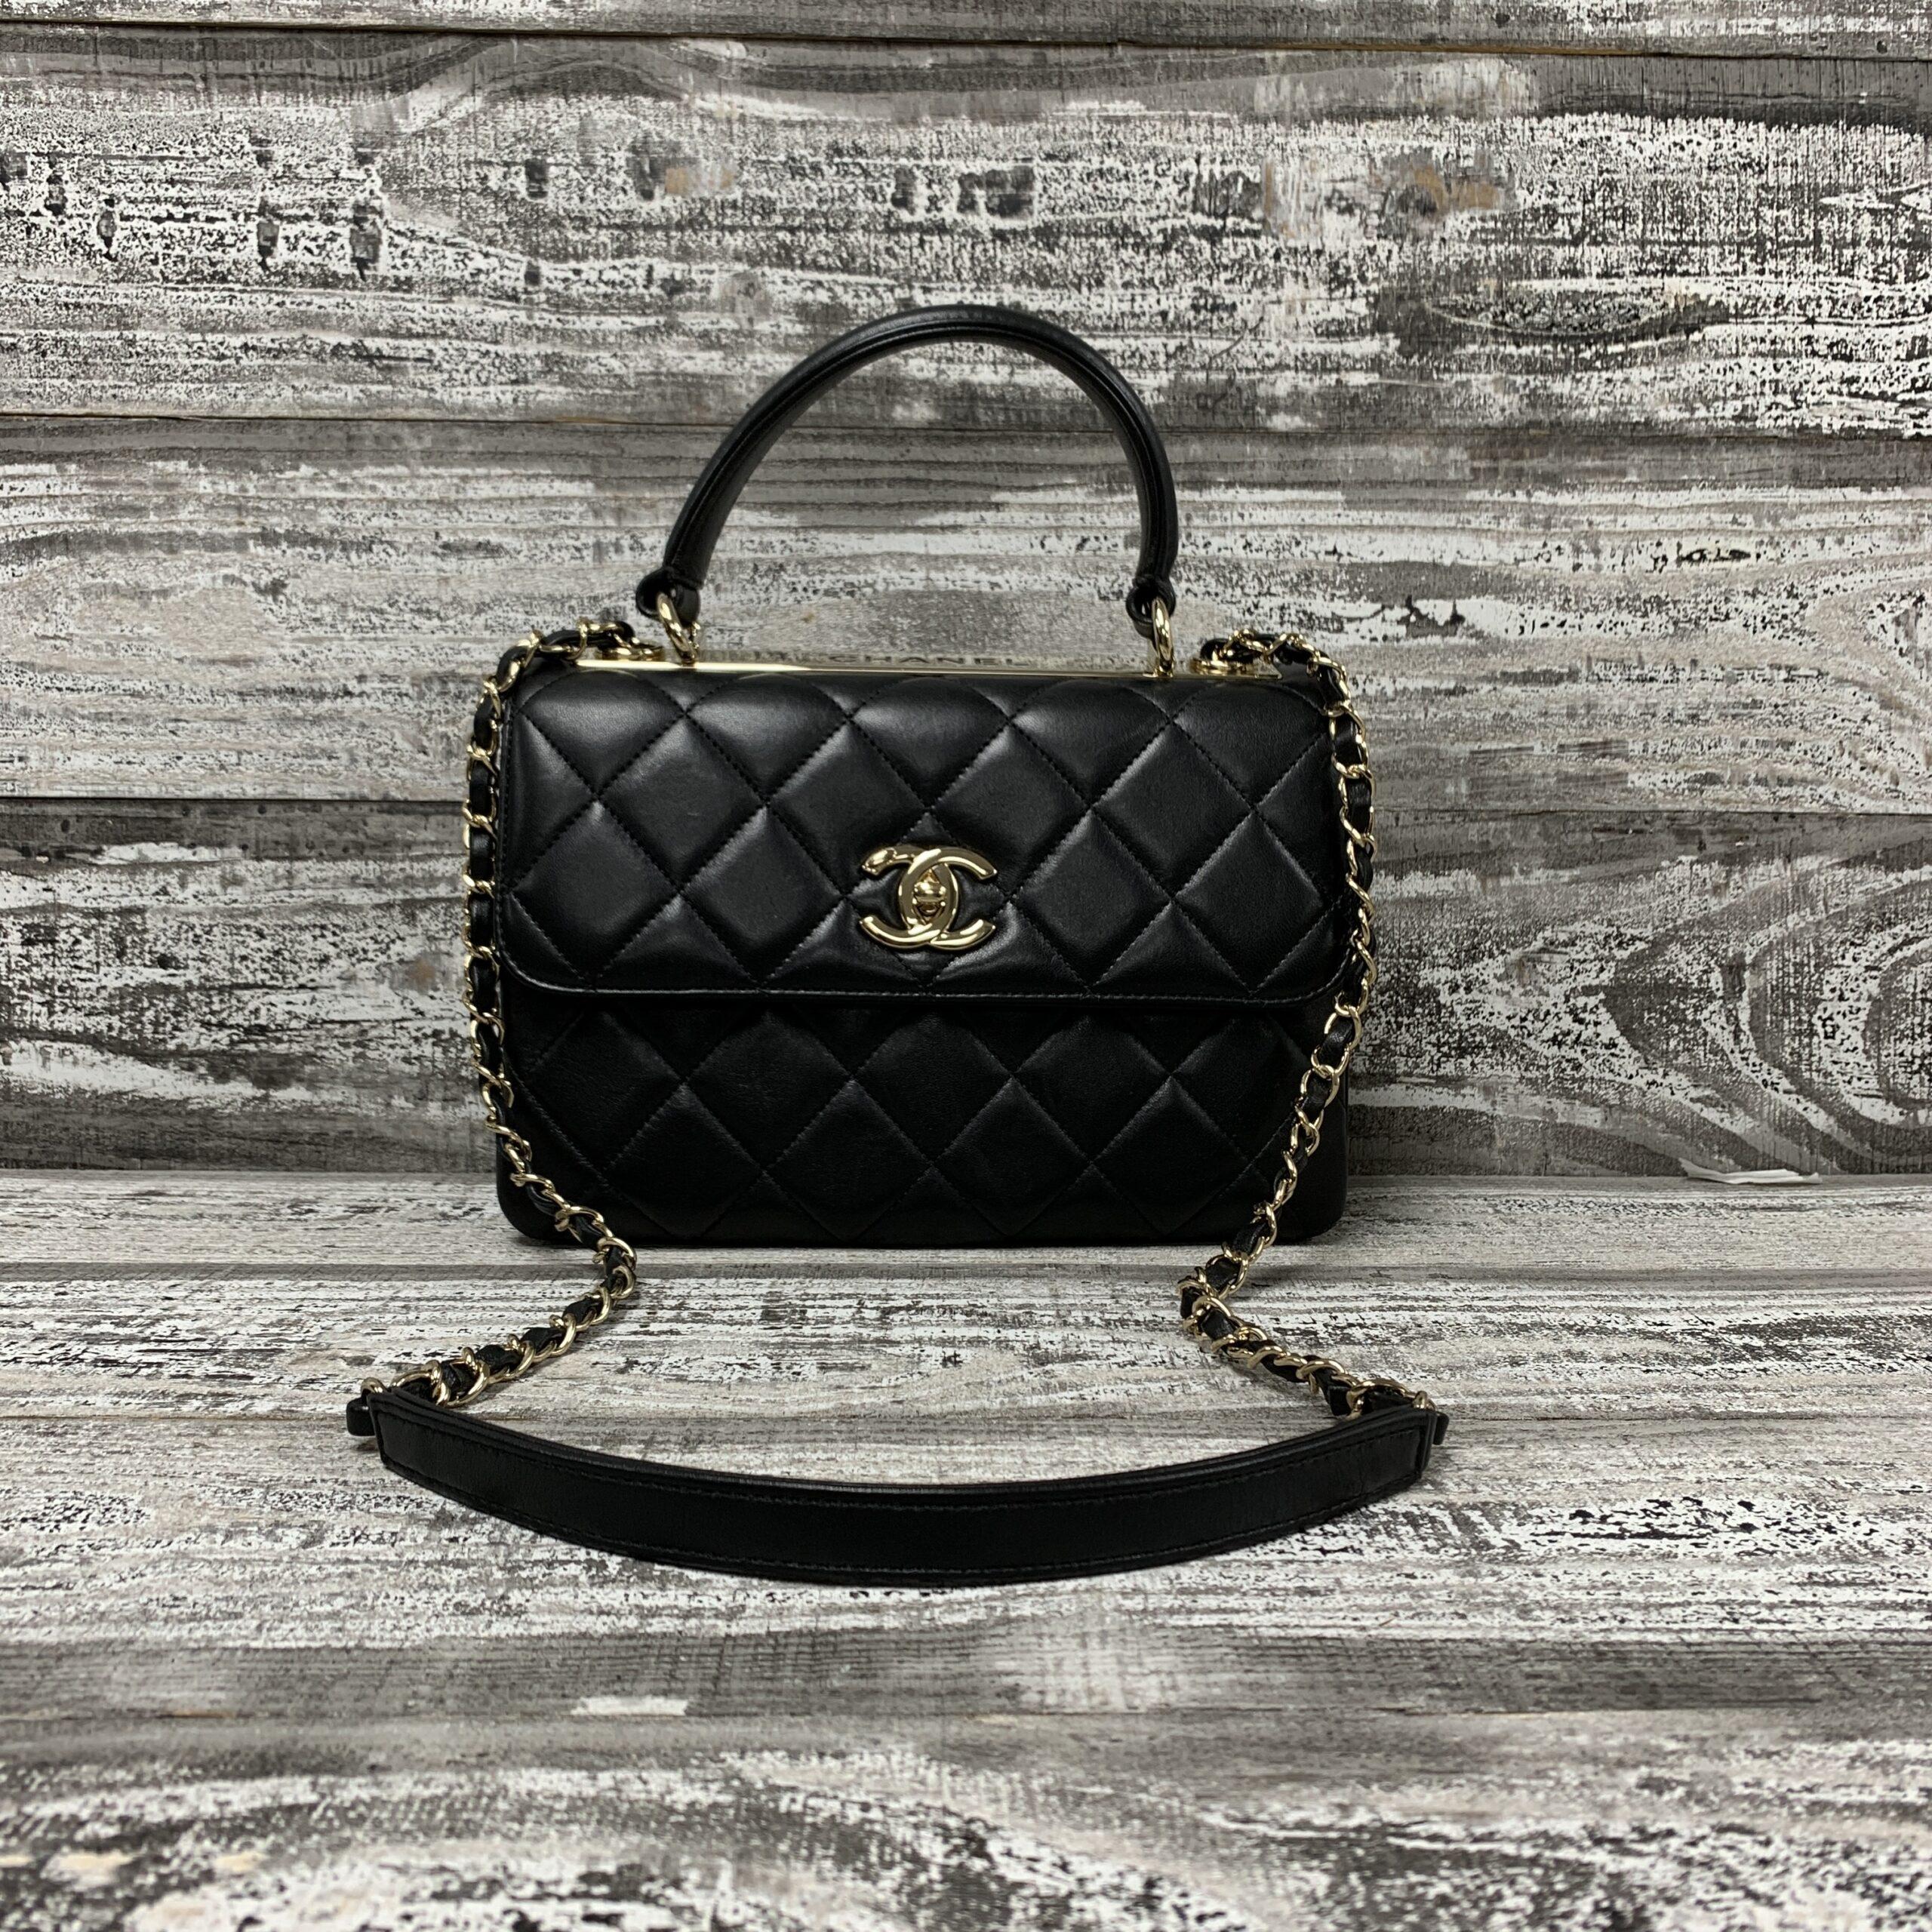 Small Chanel handbag